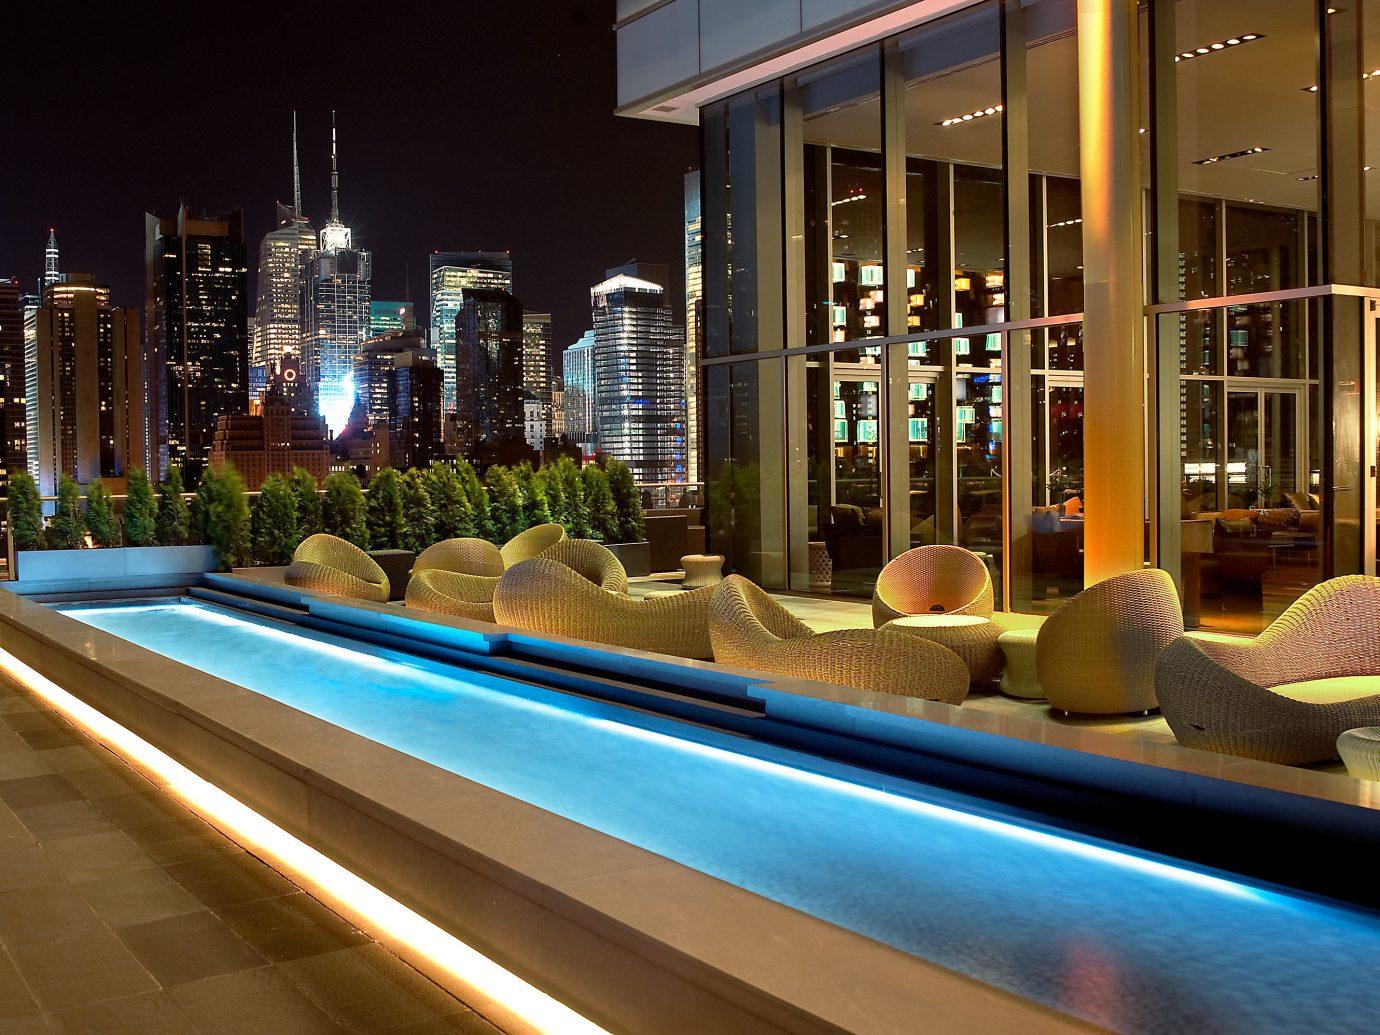 Family Travel Hotels night Lobby lighting interior design swimming pool Bar Resort restaurant